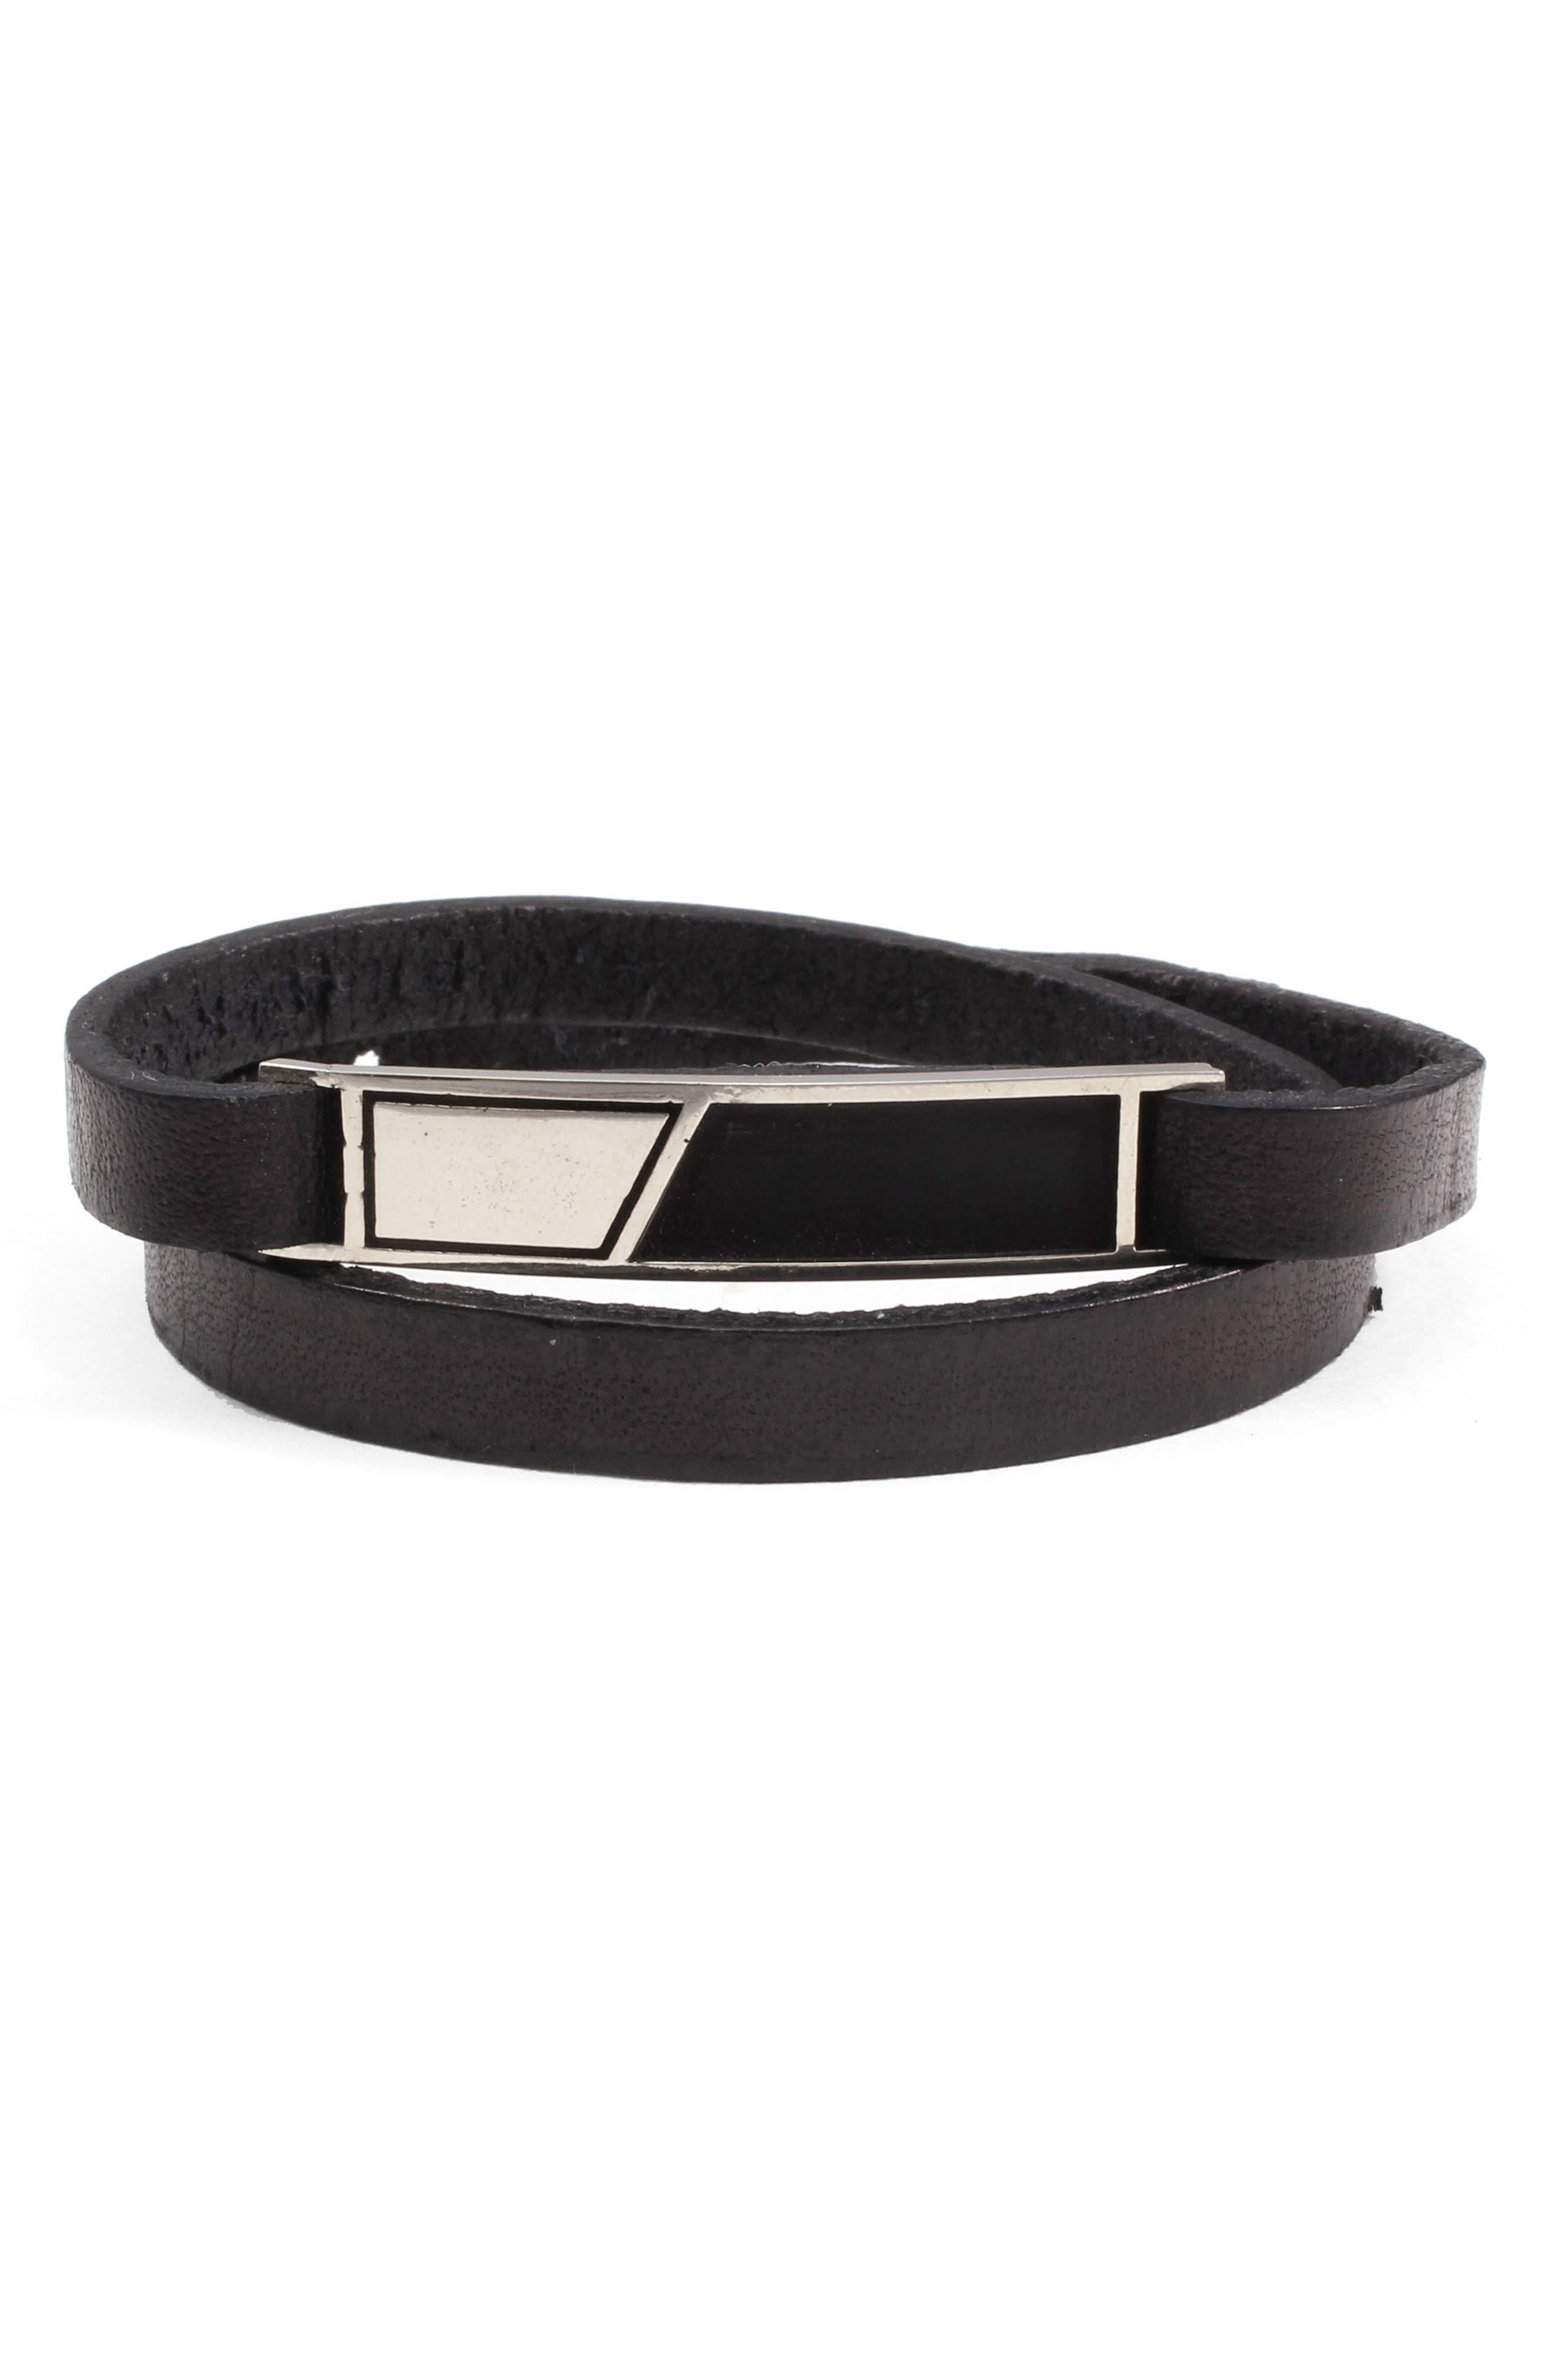 Dystopia ID Leather Wrap Bracelet,                             Main thumbnail 1, color,